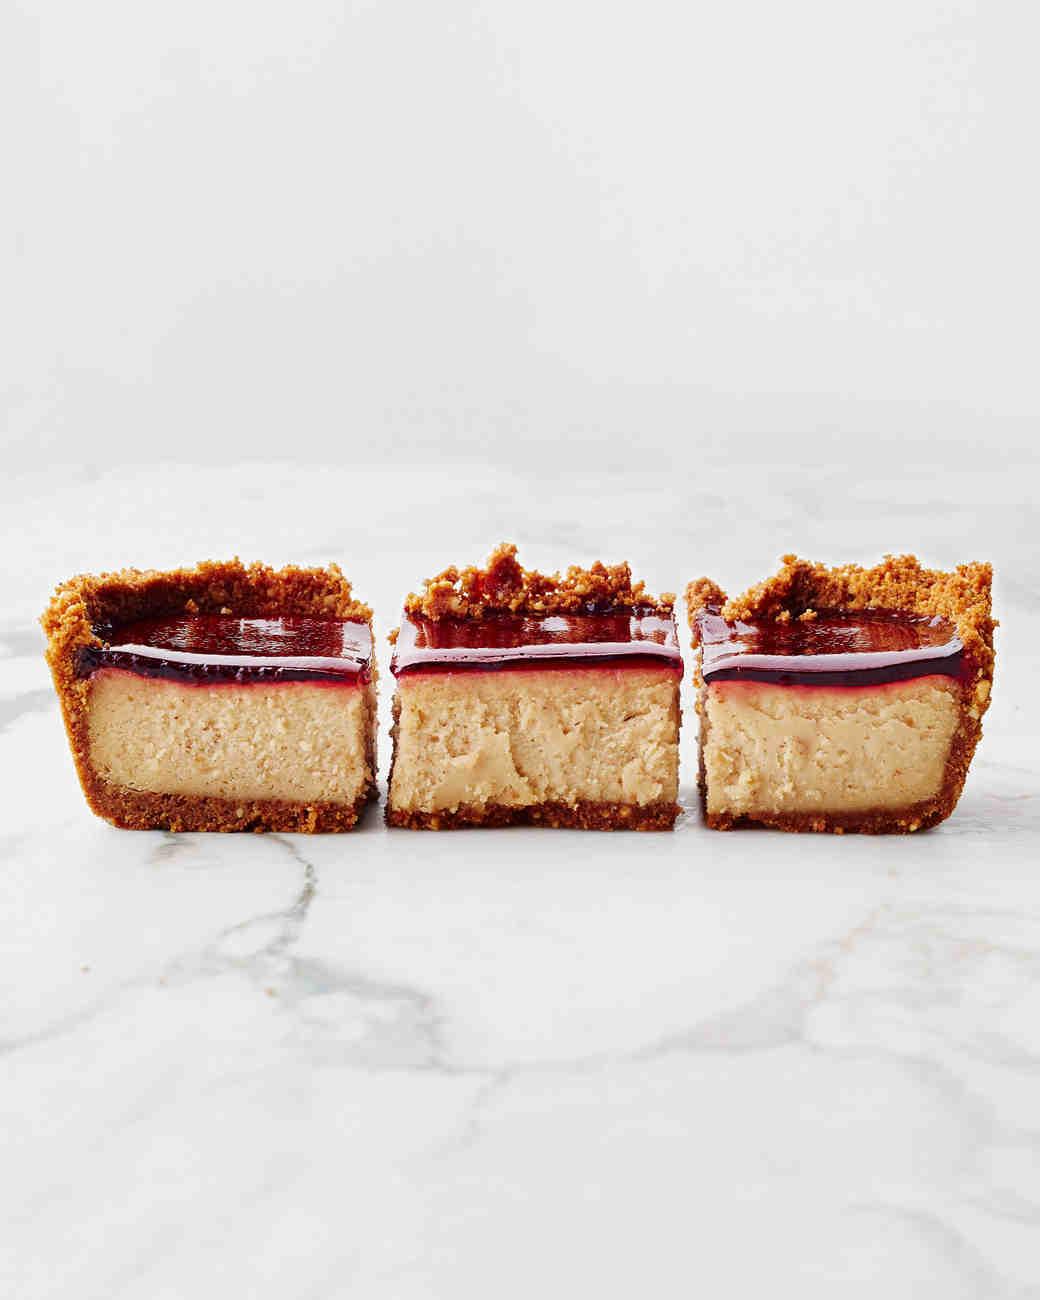 pbj-cheesecake-bars-094-d113040-1.jpg